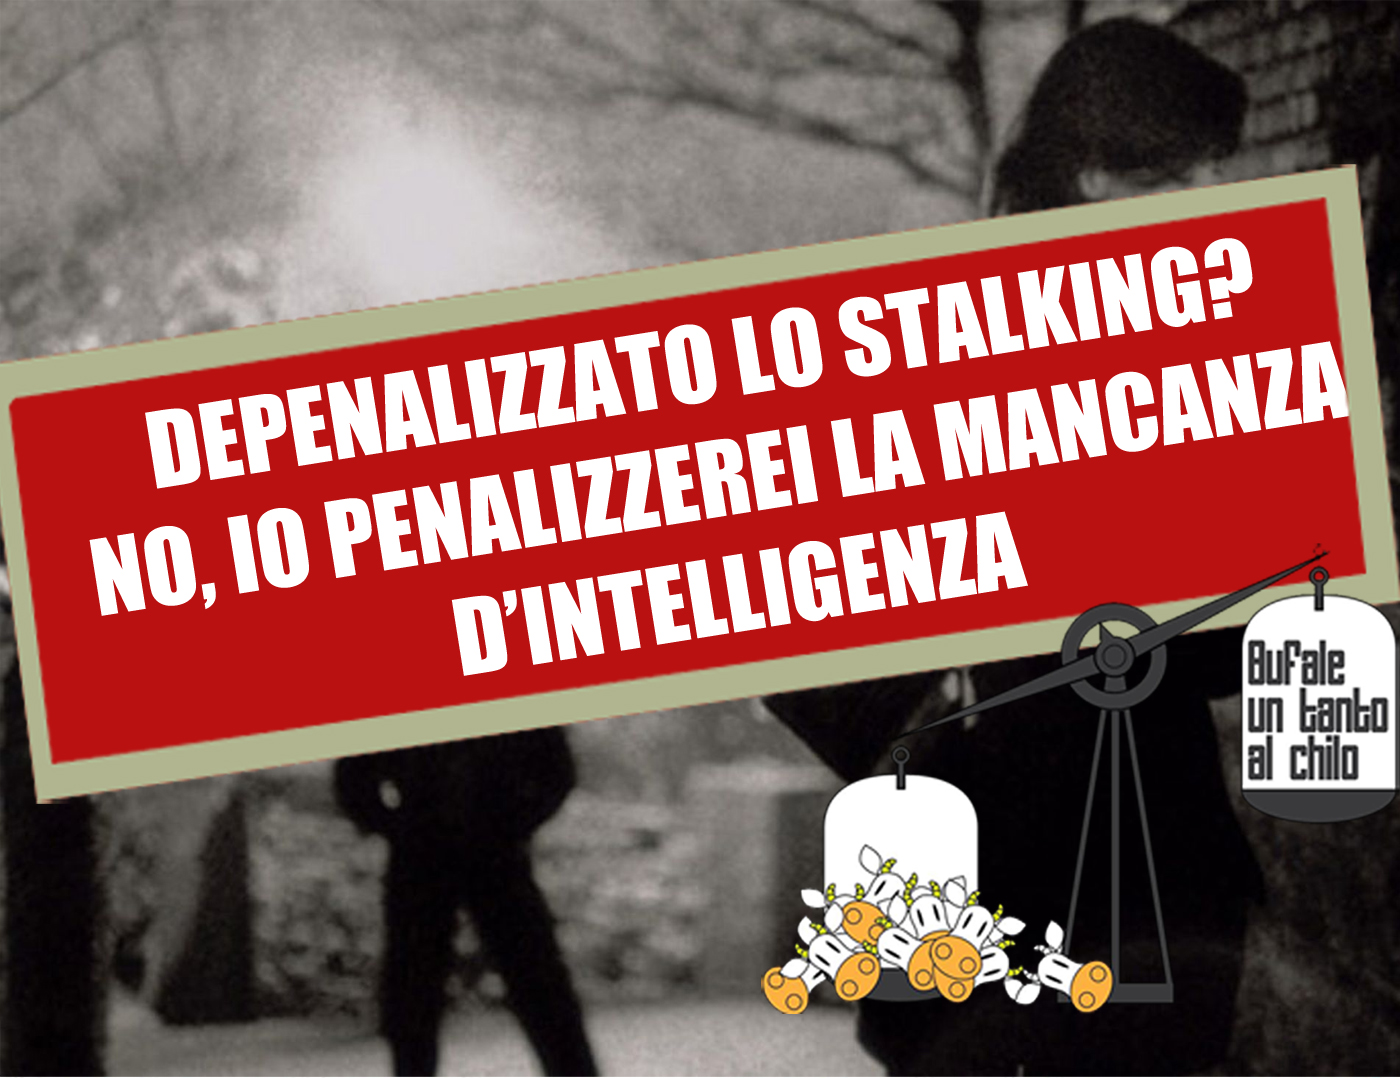 stalkingdepenalizzato